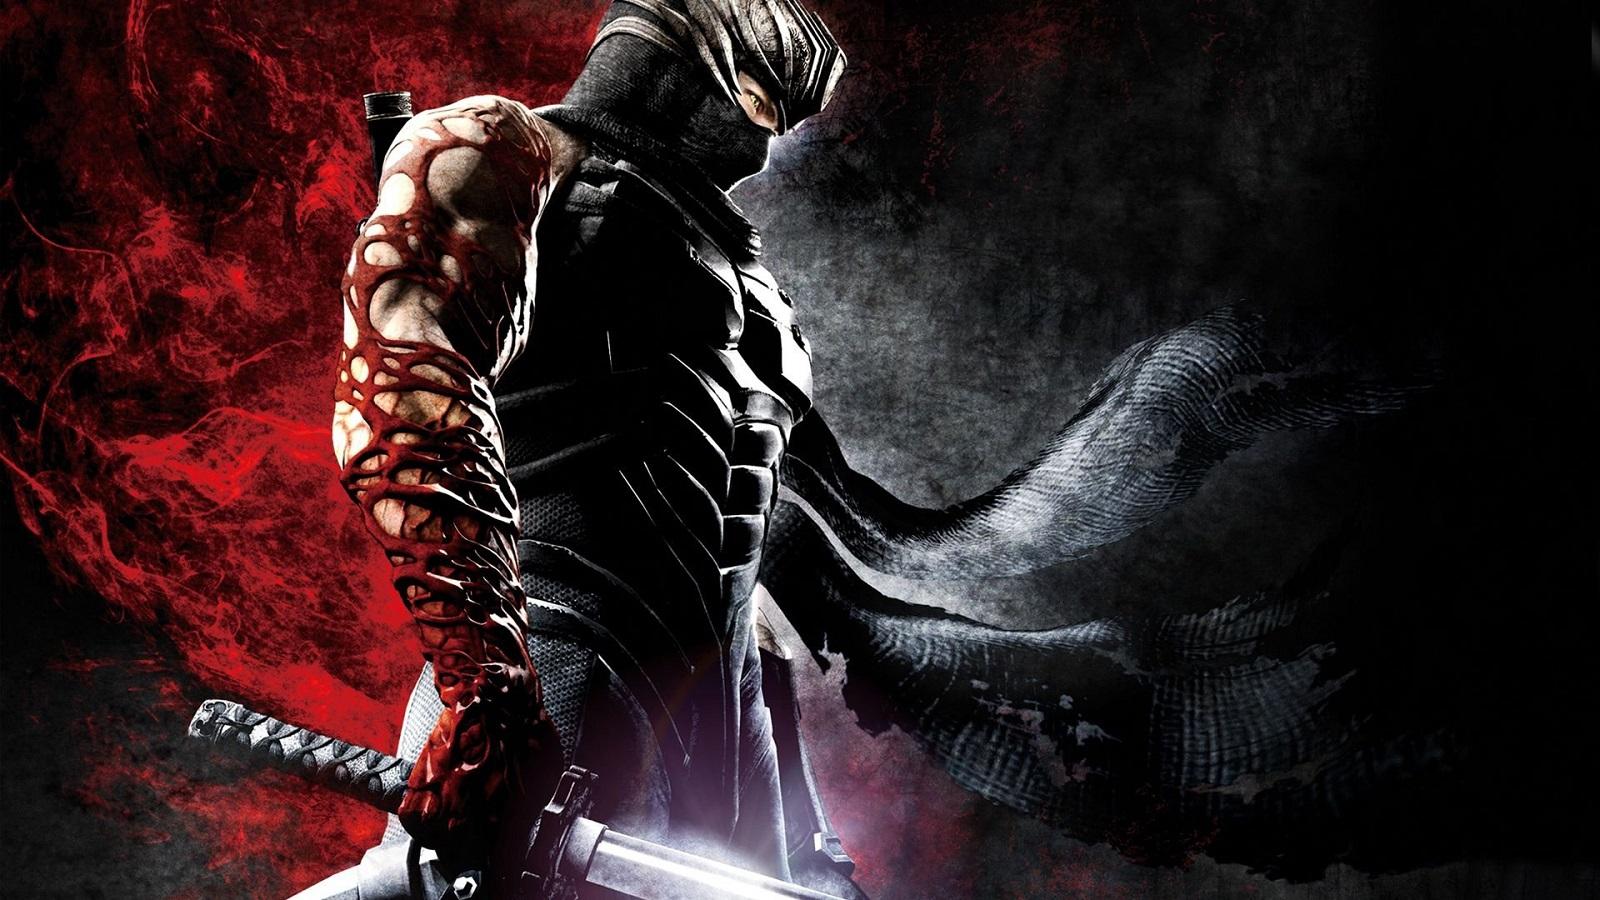 Team Ninja намекнула на скорые новости о Ninja Gaiden